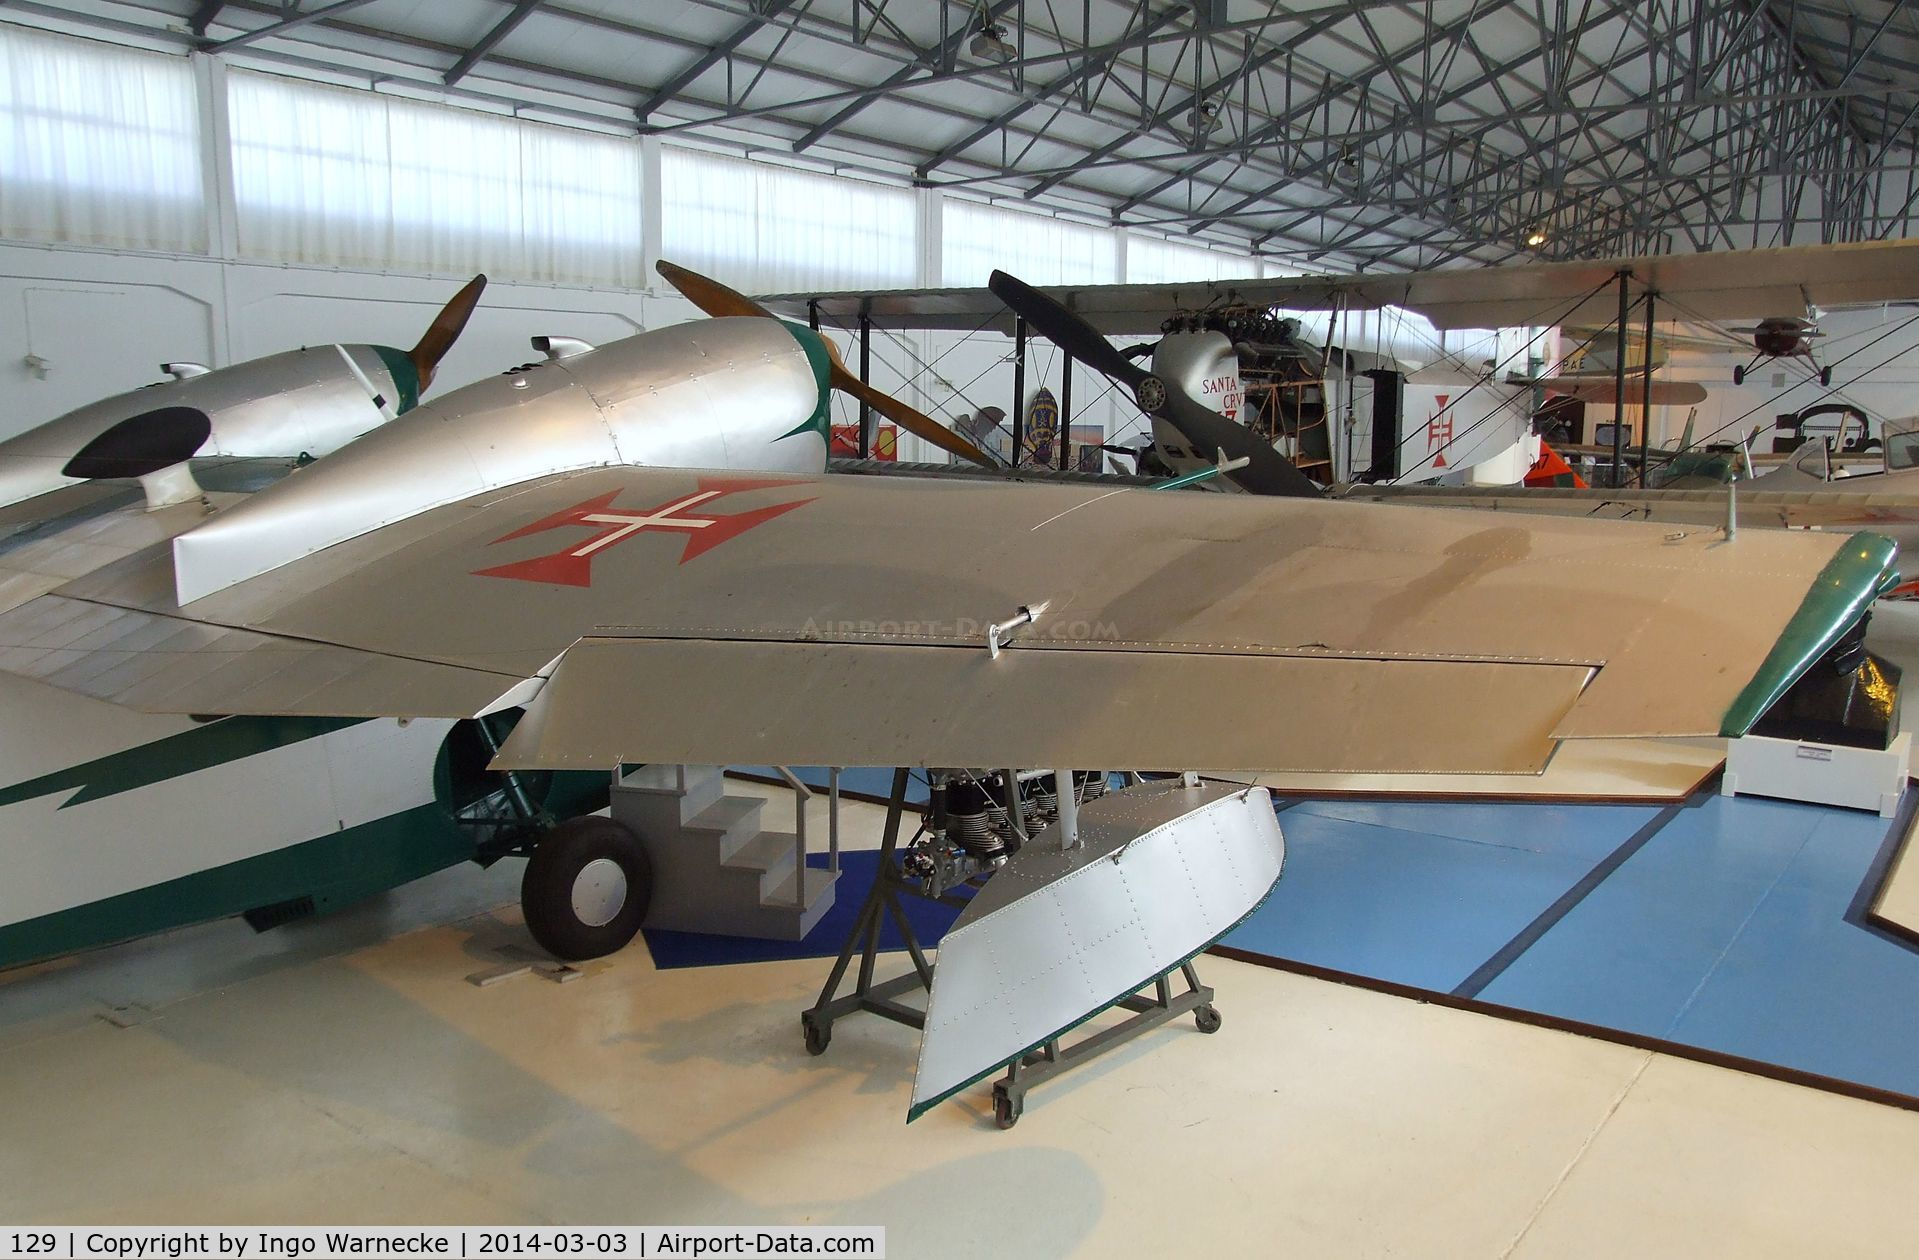 129, 1942 Grumman G-44 Widgeon C/N 1251, Grumman G.44 Widgeon at the Museu do Ar, Alverca